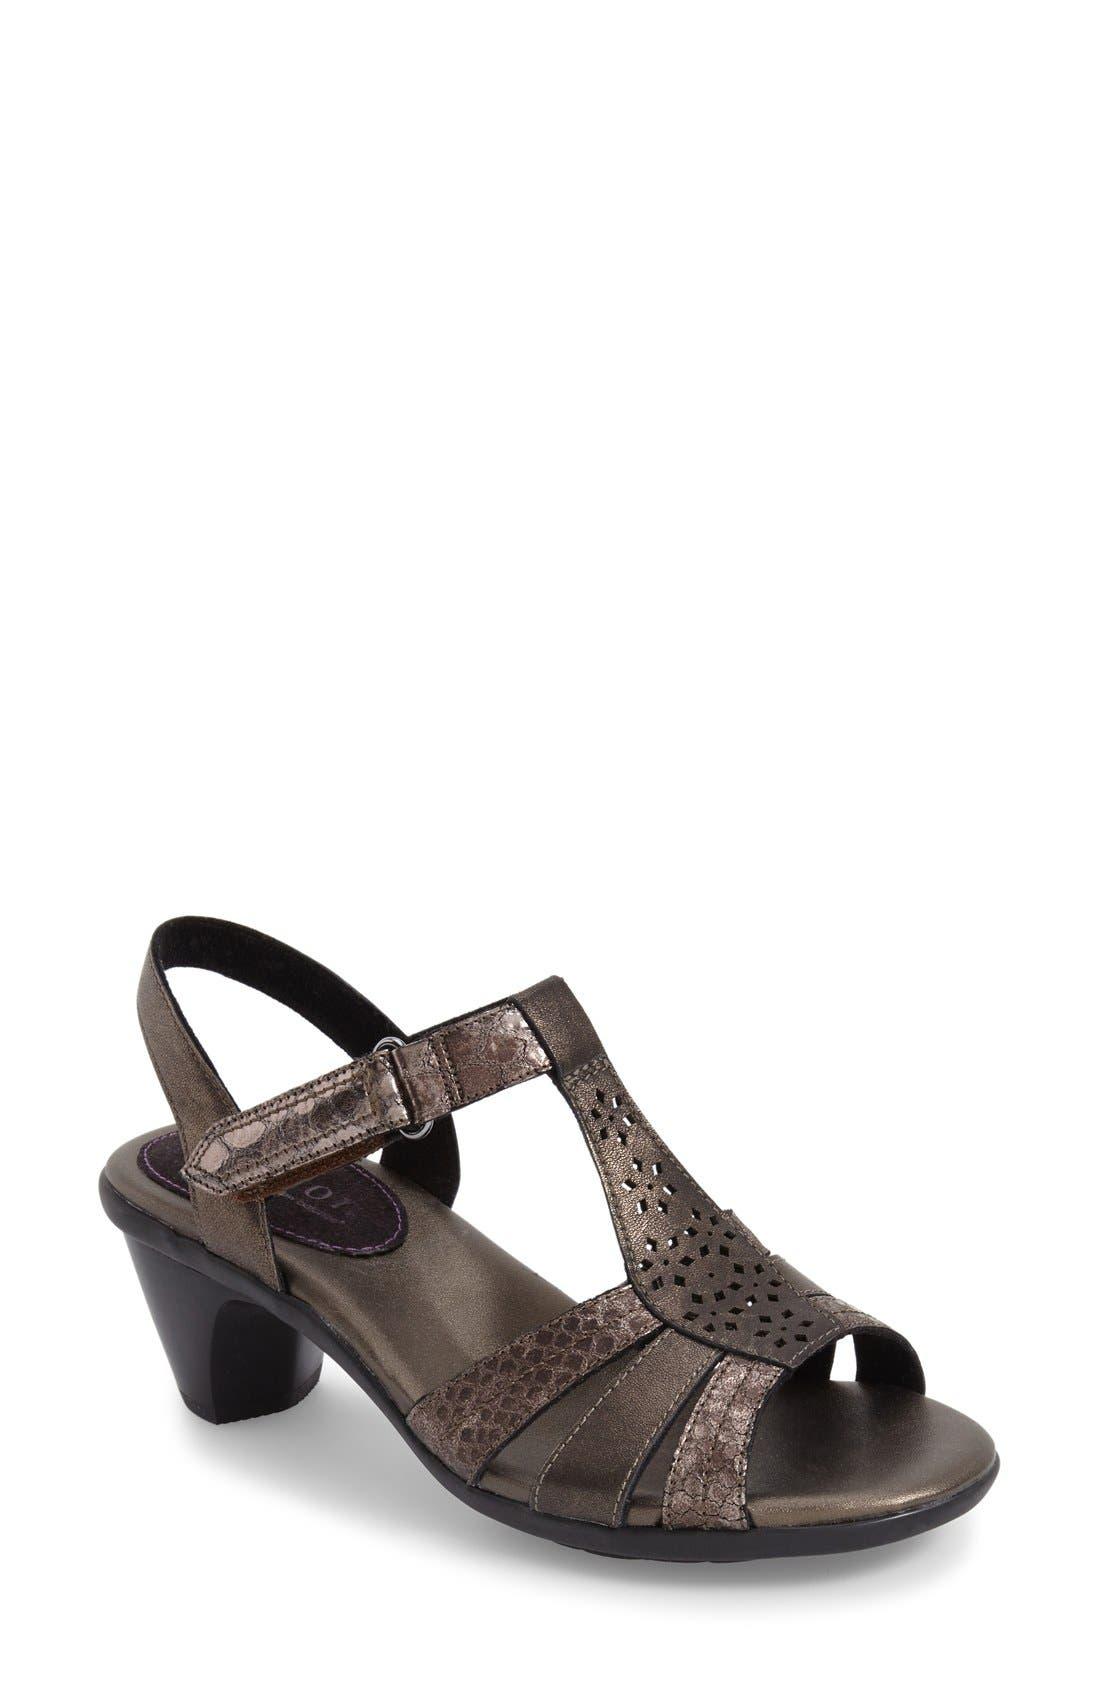 ARAVON 'Mary' T-Strap Sandal